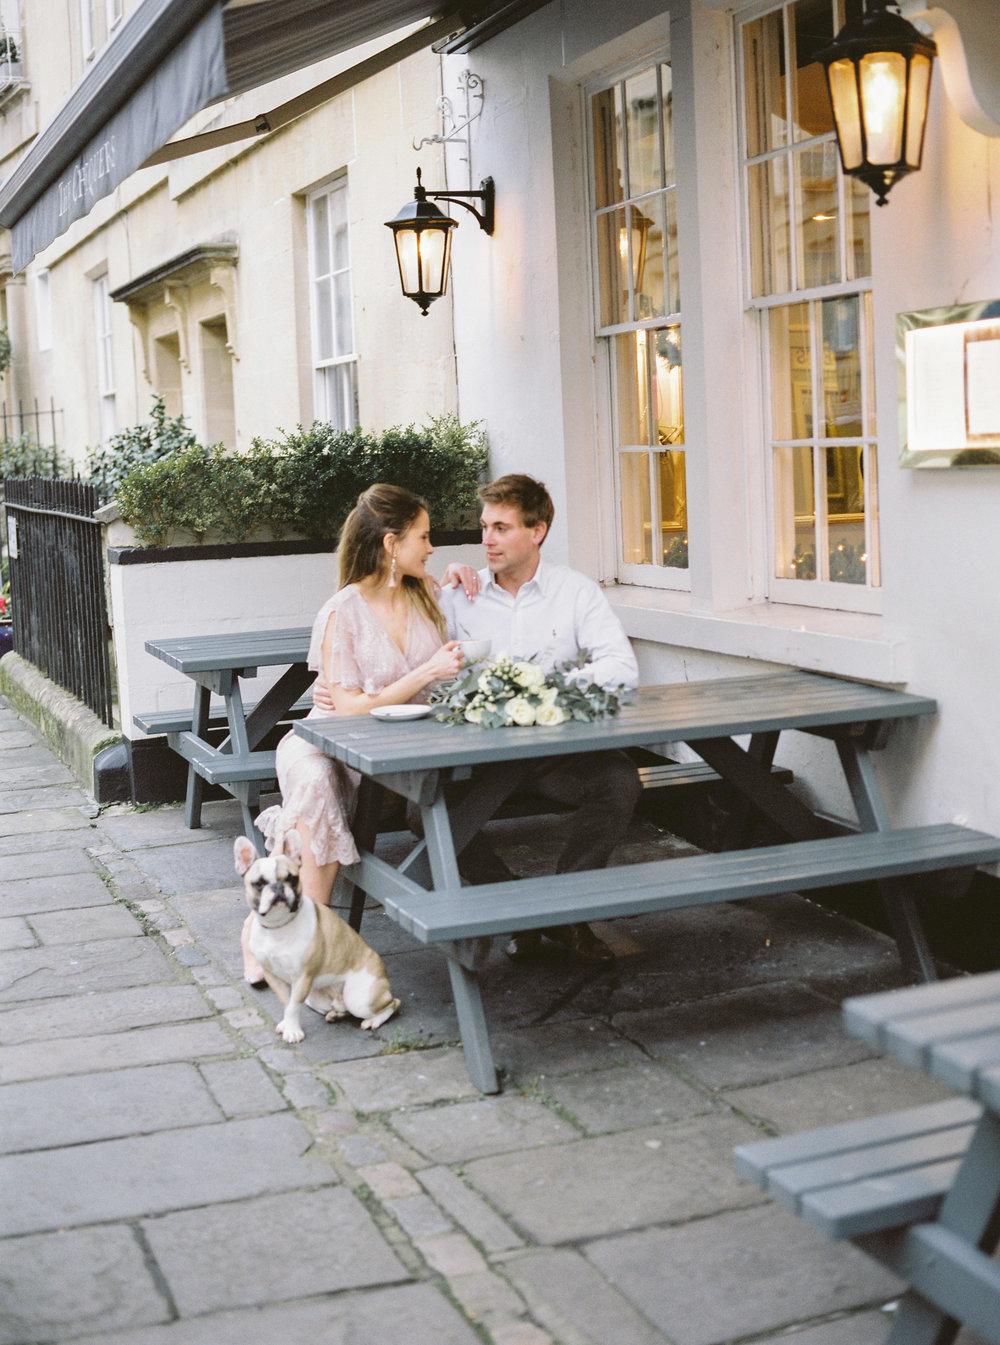 Luxury Wedding Planner UK | Our Chic & Romantic Engagement Shoot in Bath | Katie Julia Photography - 90.JPG